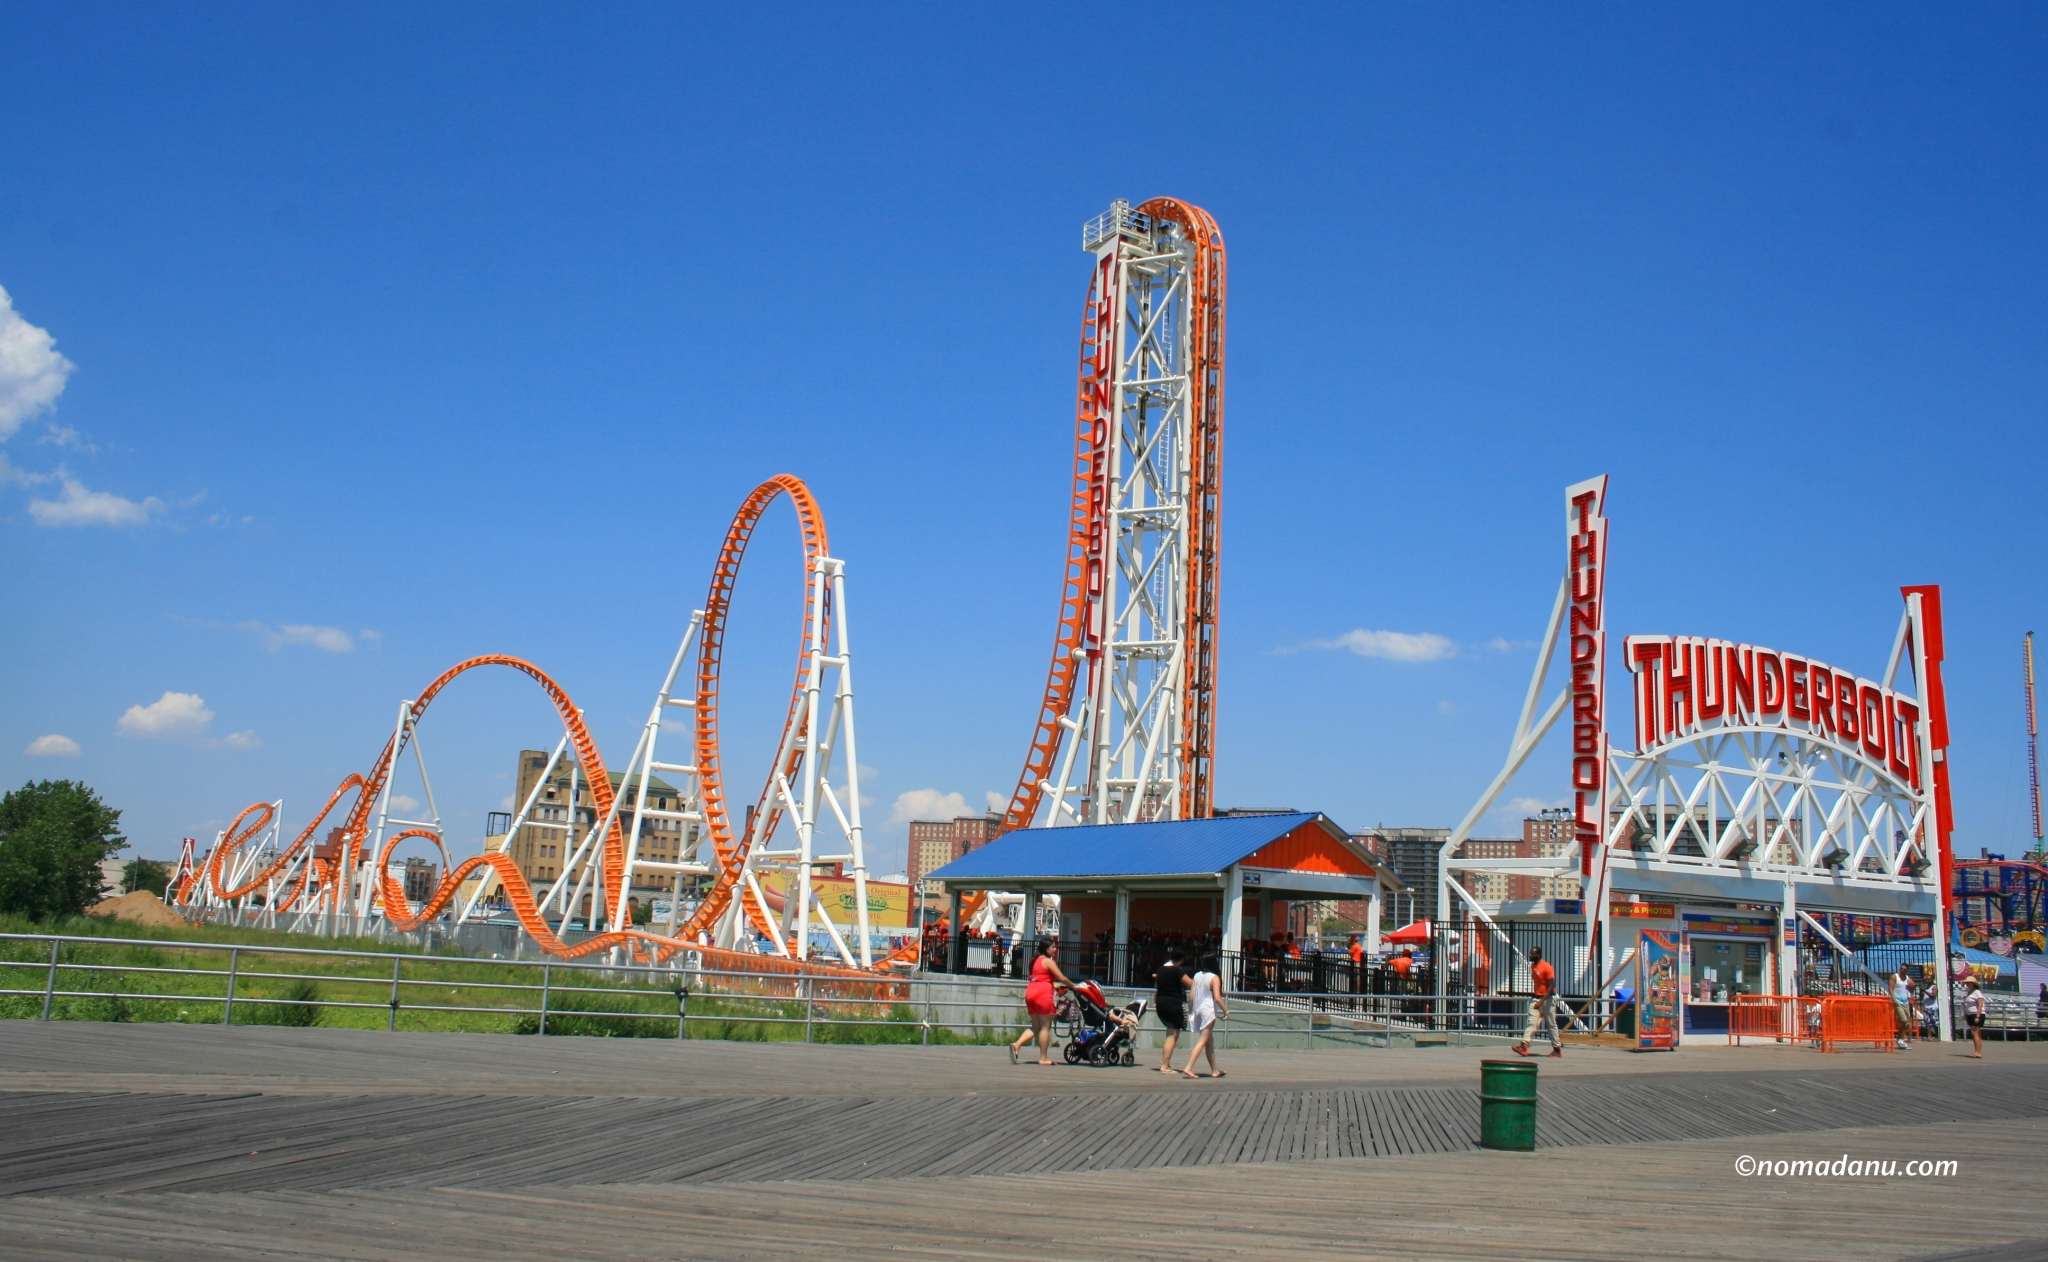 Luna Park Thunderbolt